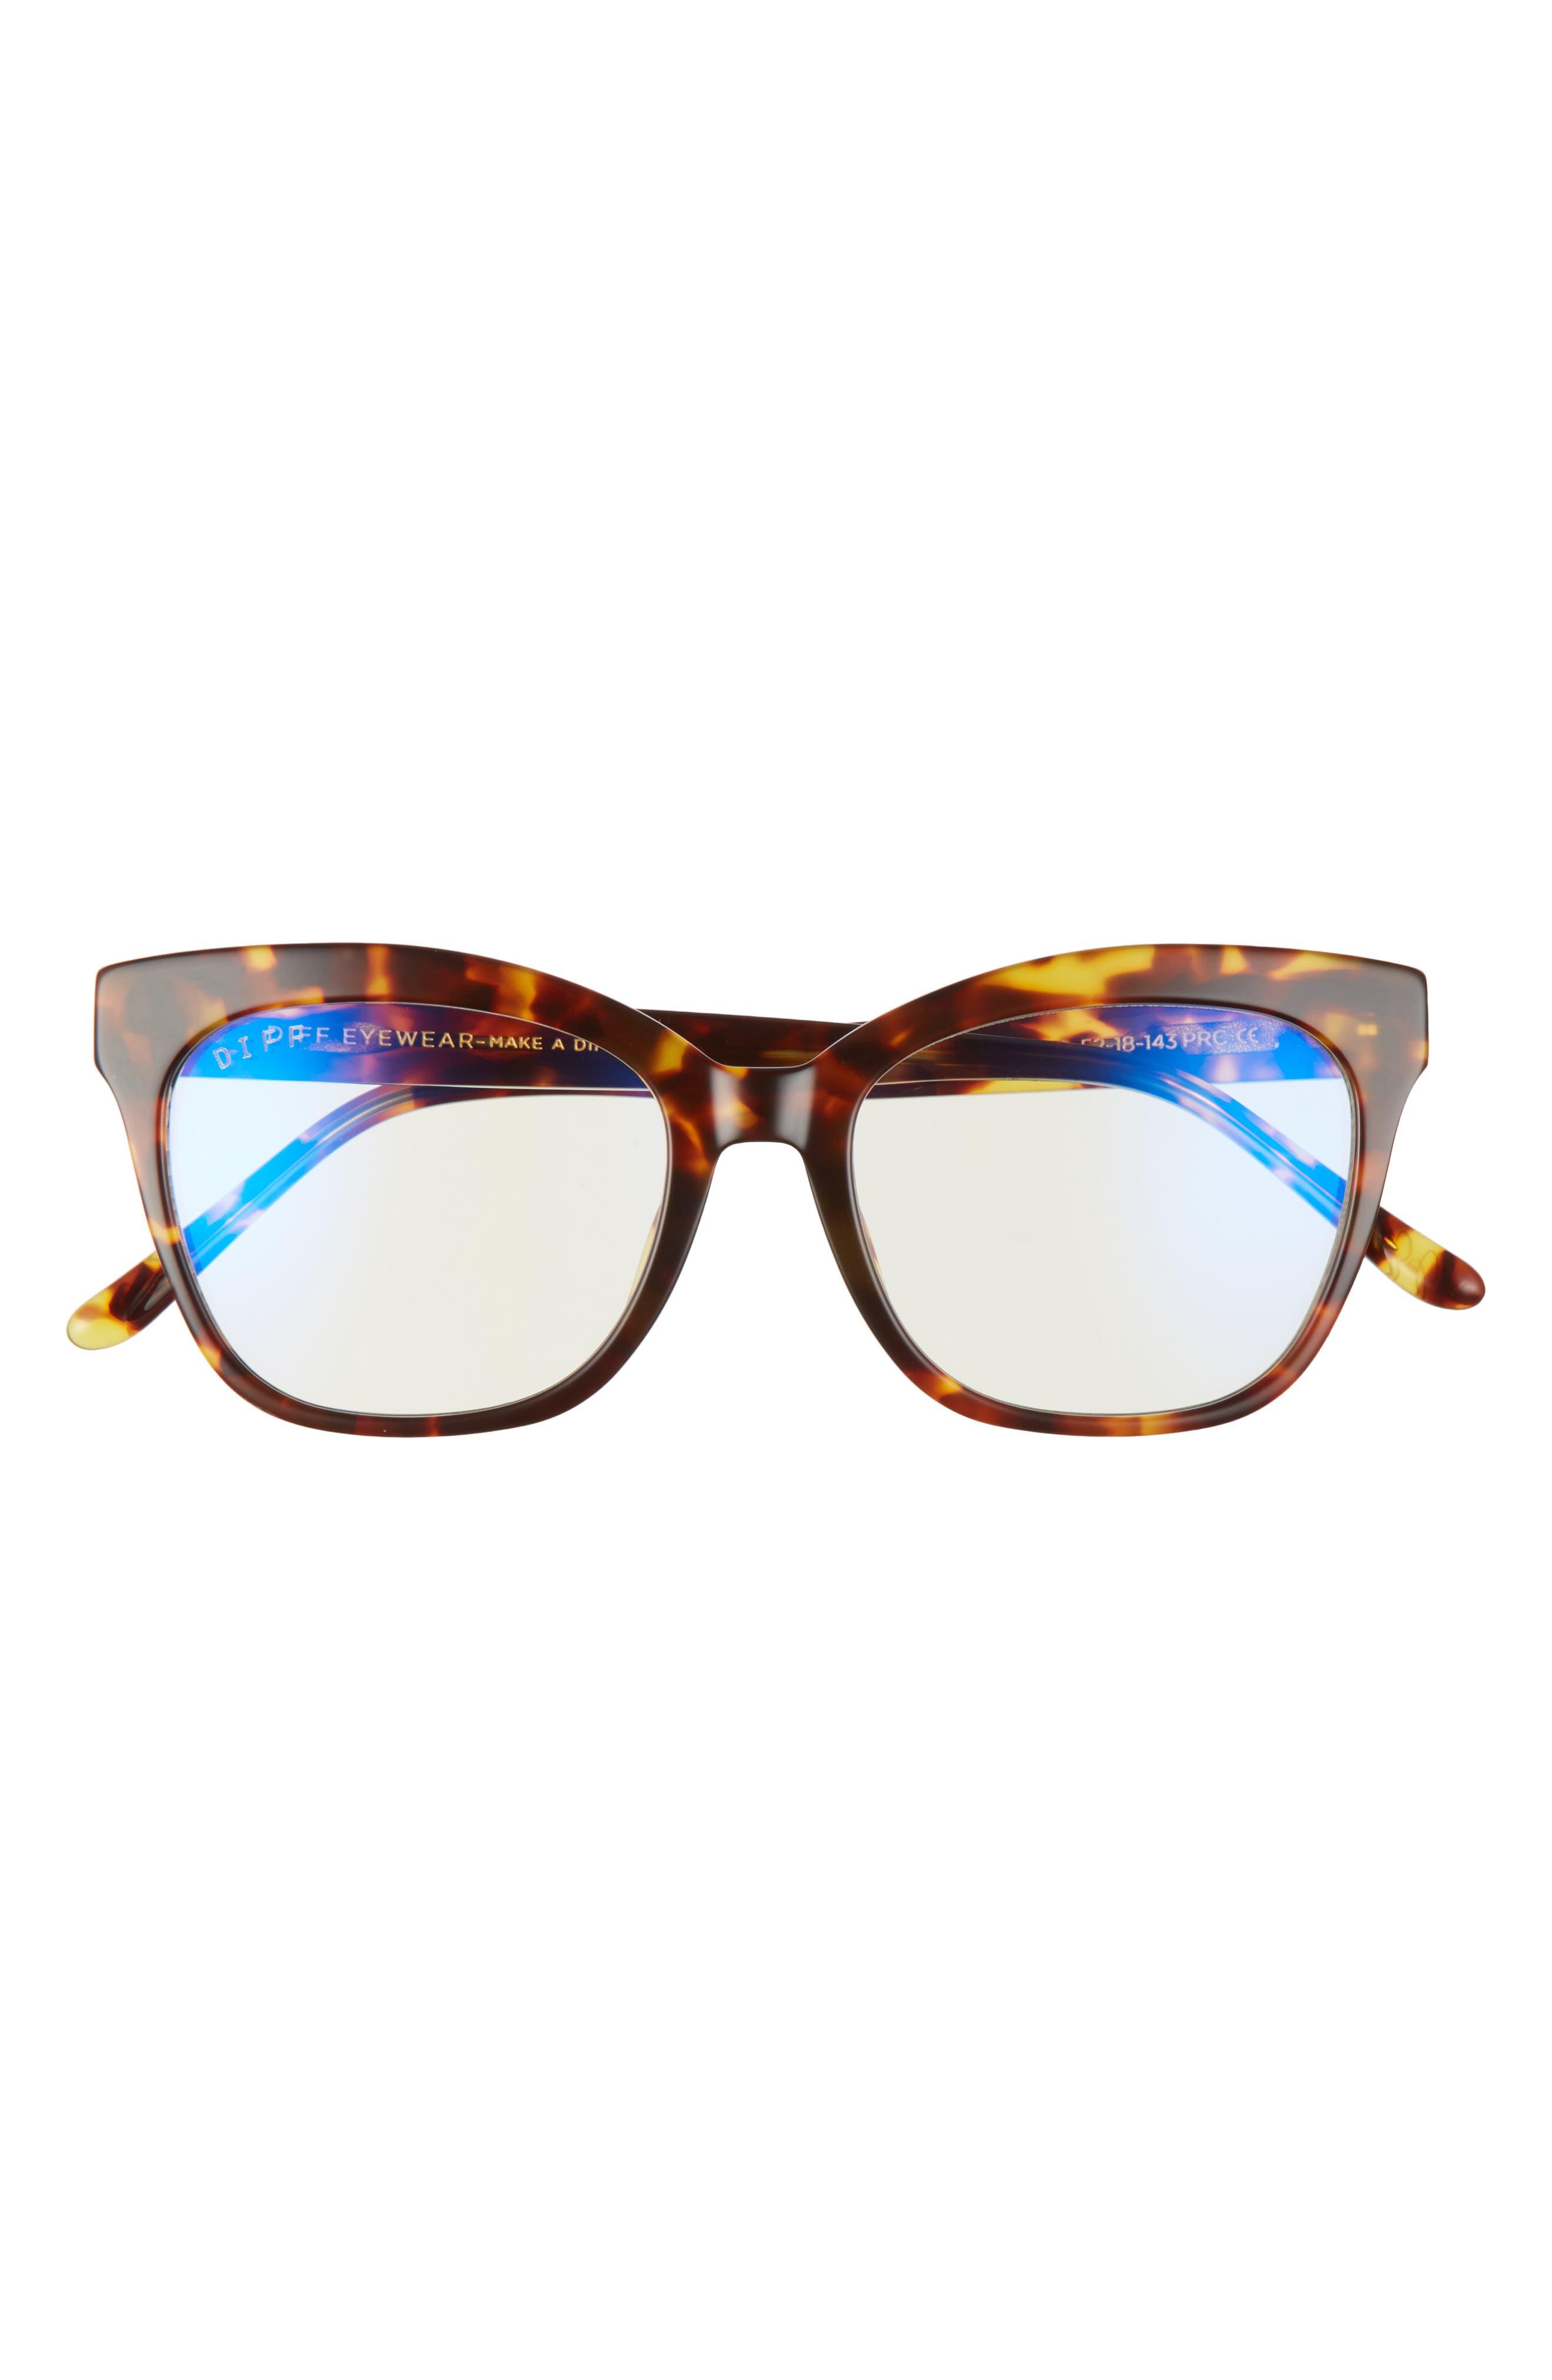 Dash 61mm Cat Eye Blue Light Blocking Glasses